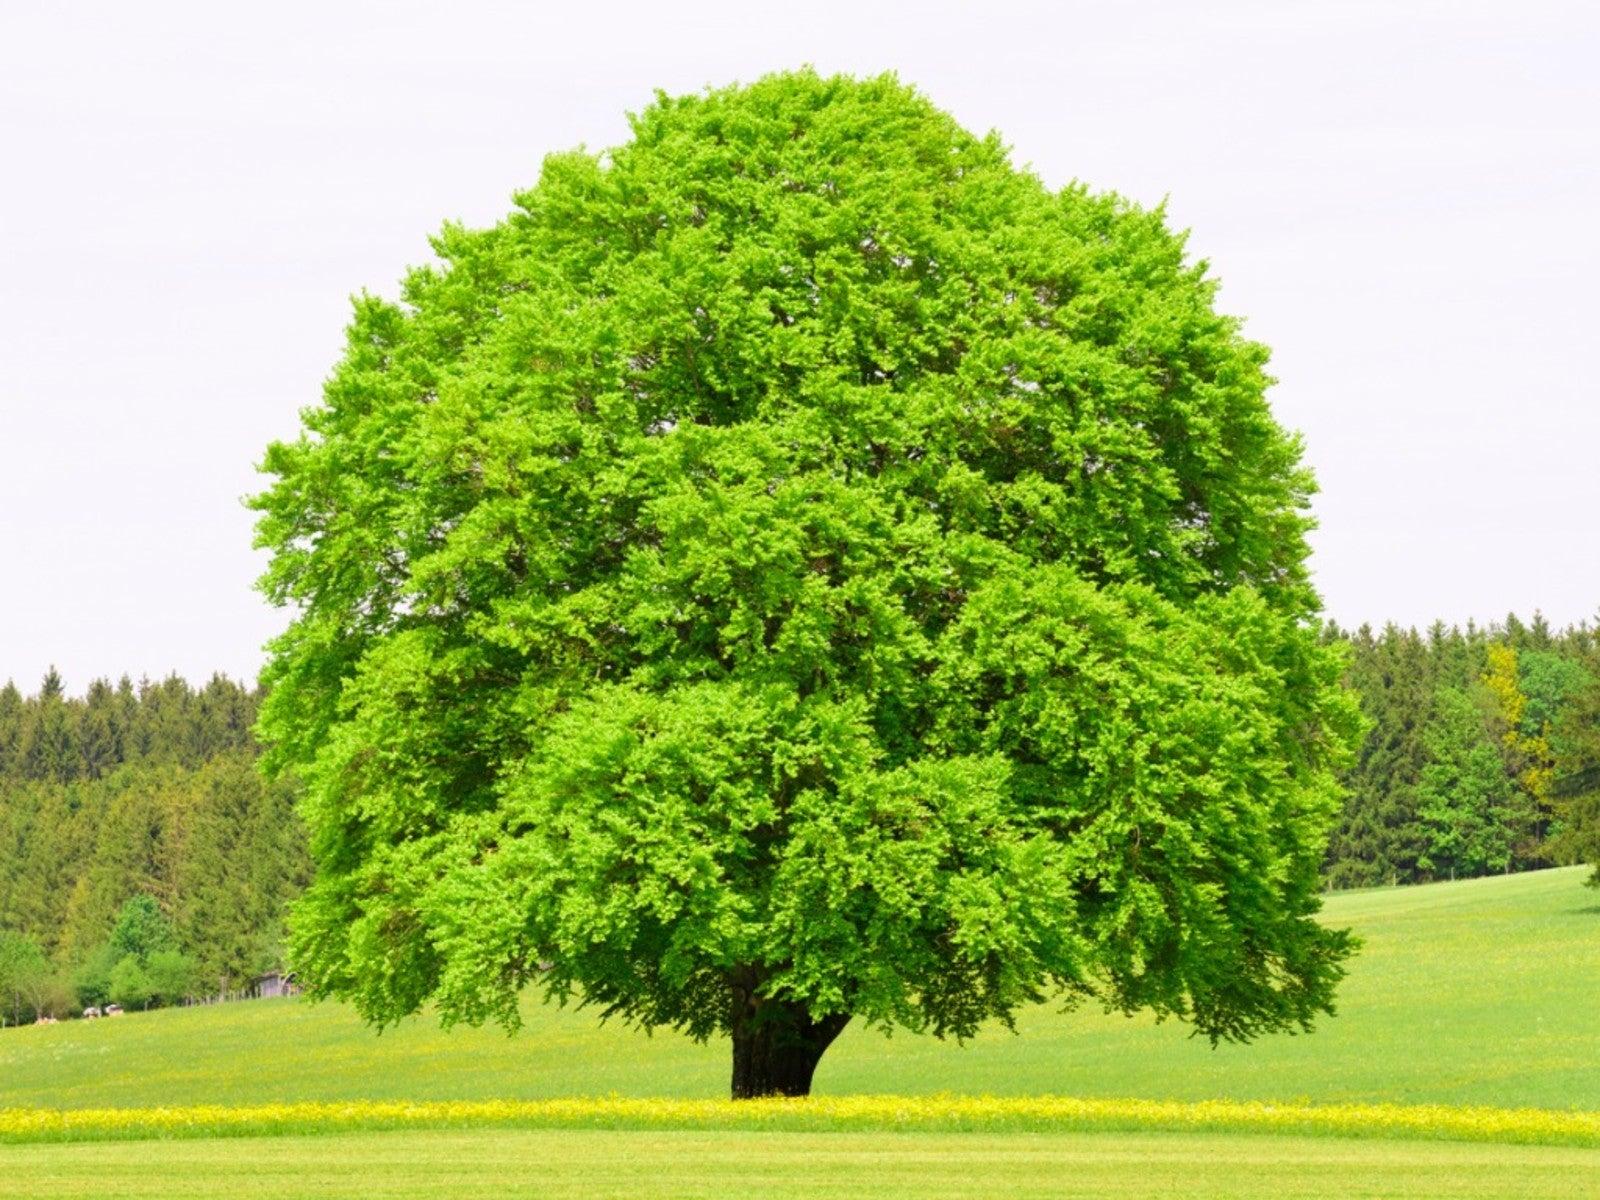 https://www.gardeningknowhow.com/wp-content/uploads/2021/02/single-big-beech-tree.jpg